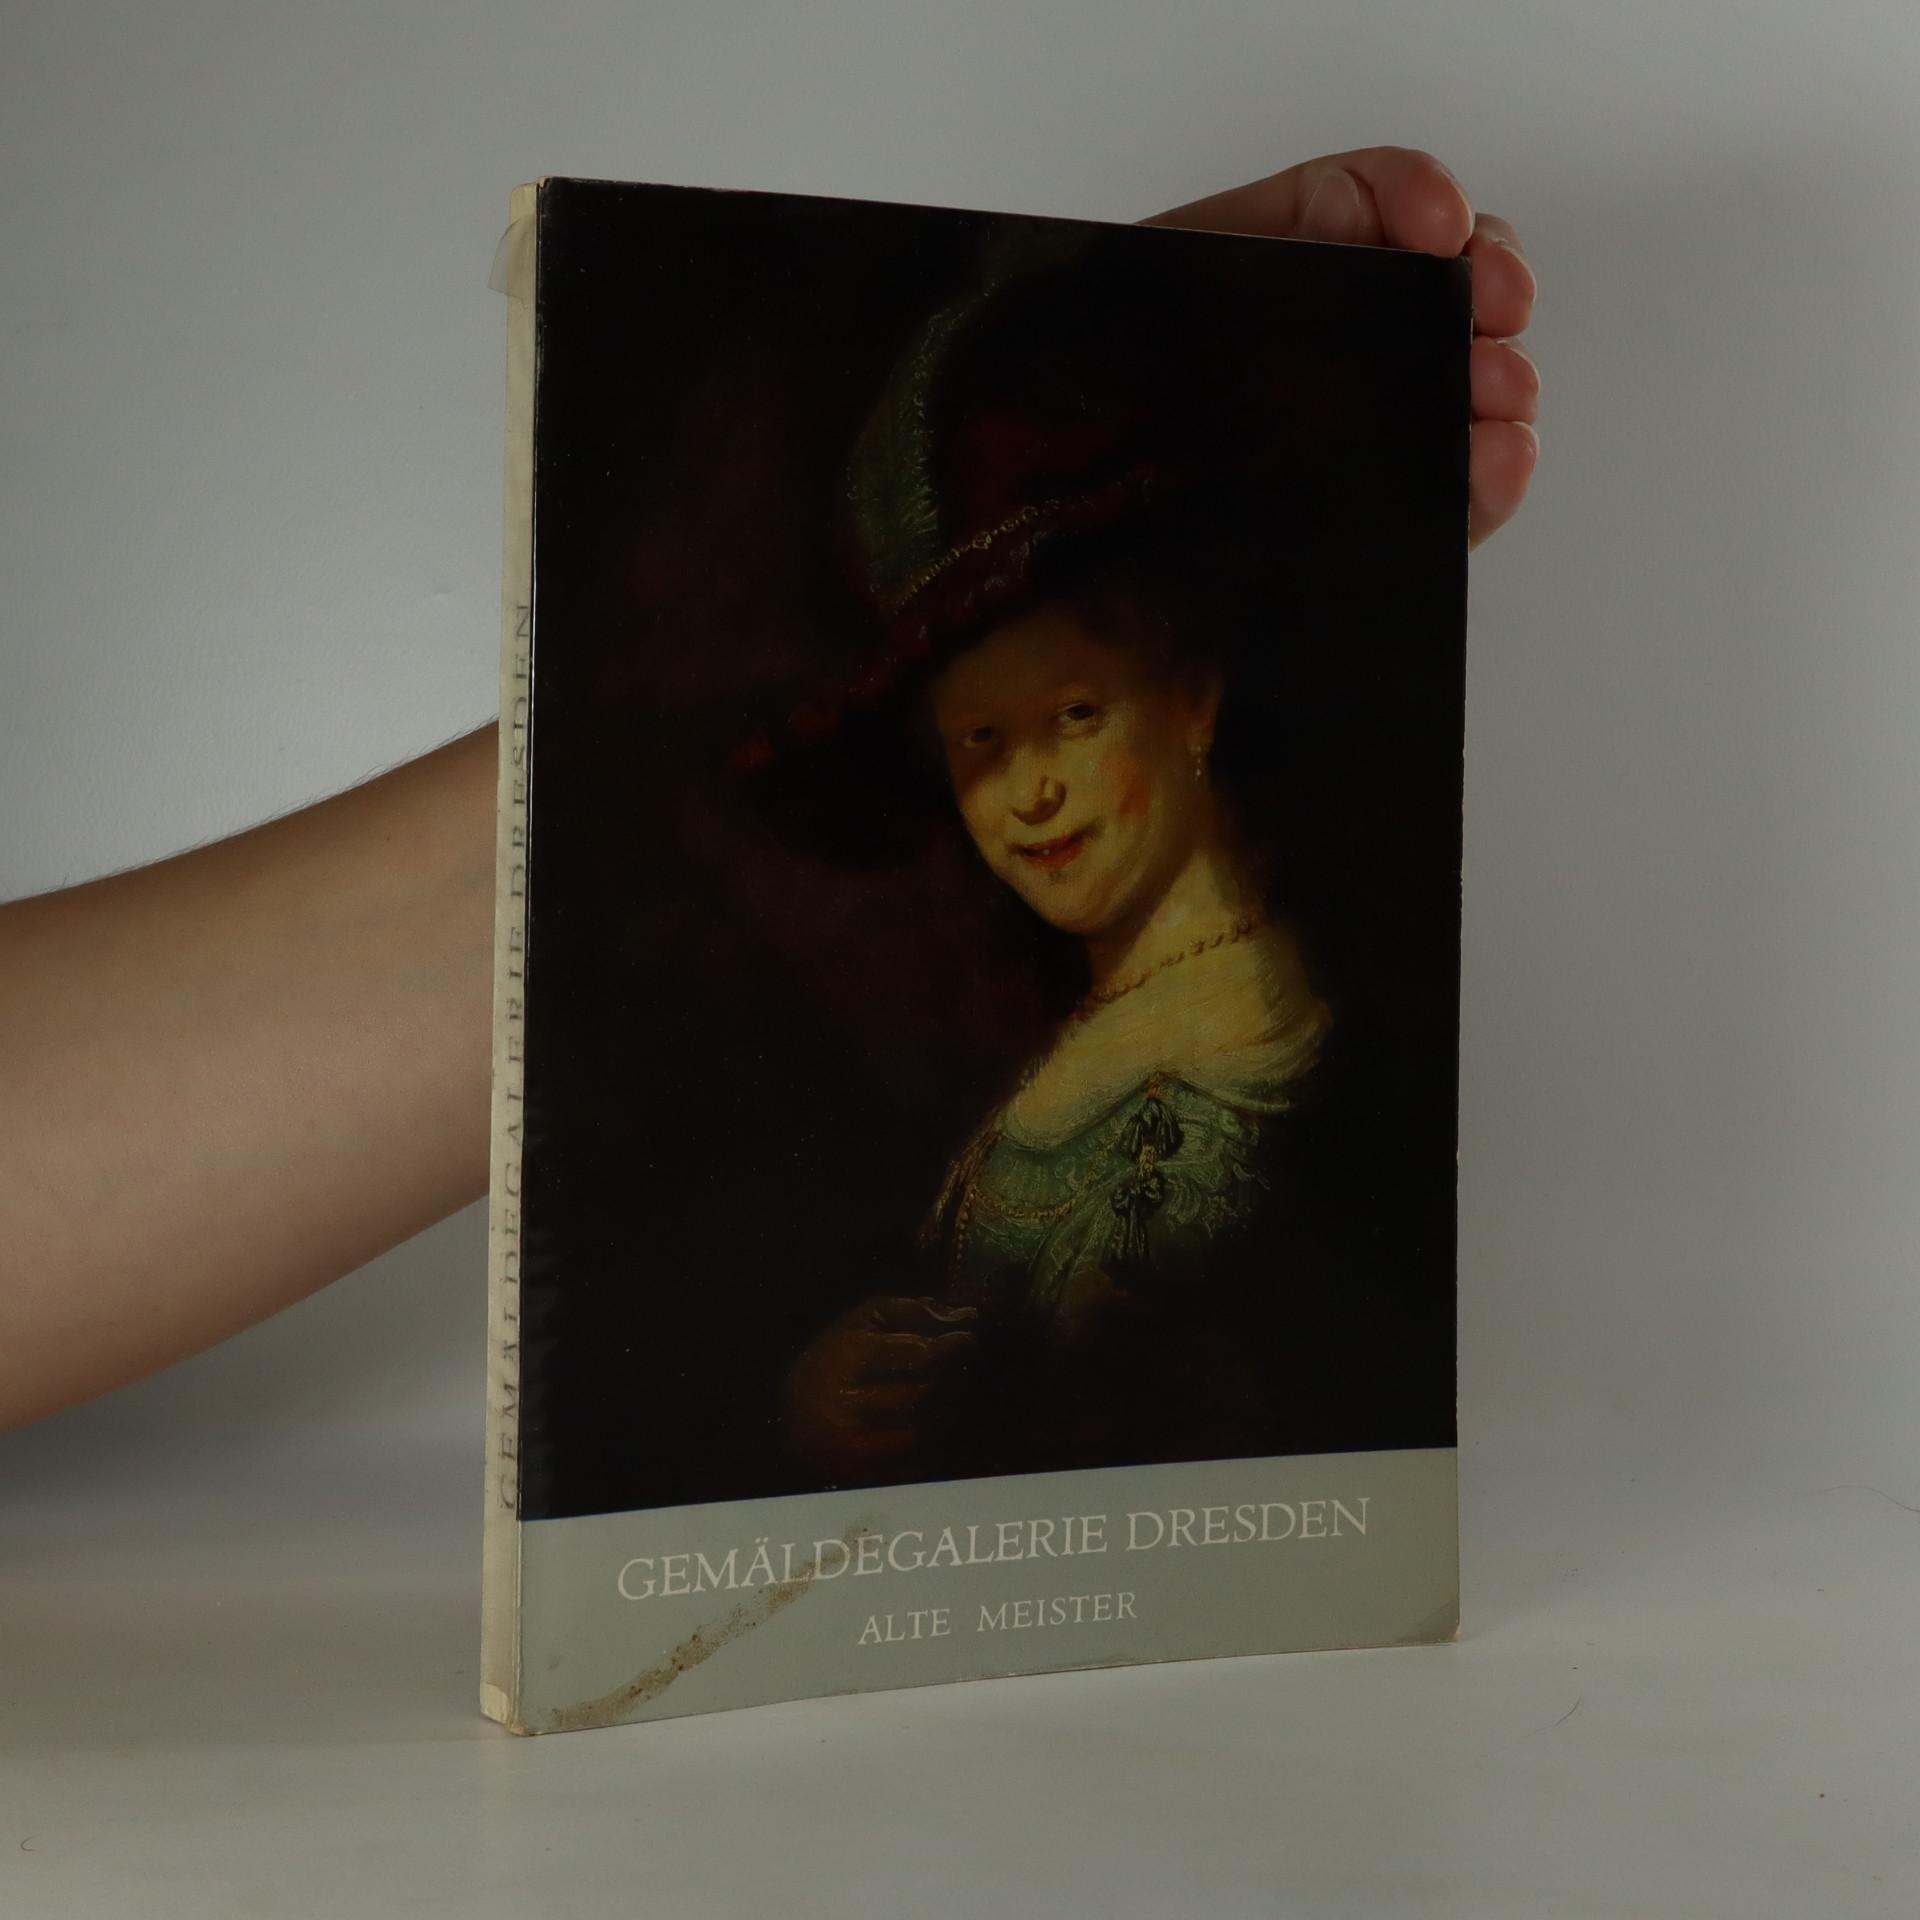 antikvární kniha Gemäldegalerie Dresden. Alte Meister, 1974